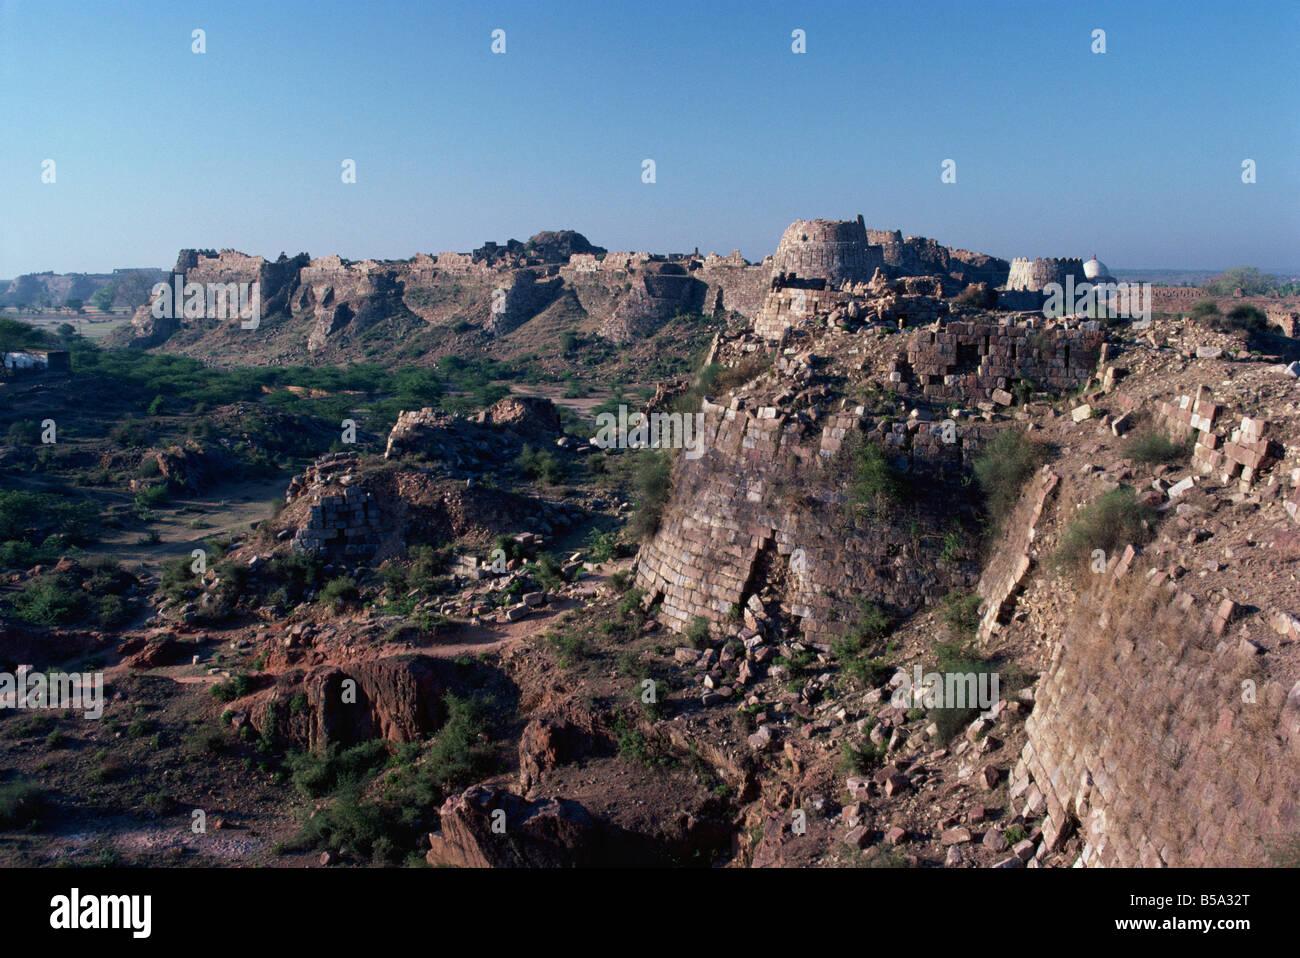 Ramparts, Tughlaqabad, Haryana state, India - Stock Image